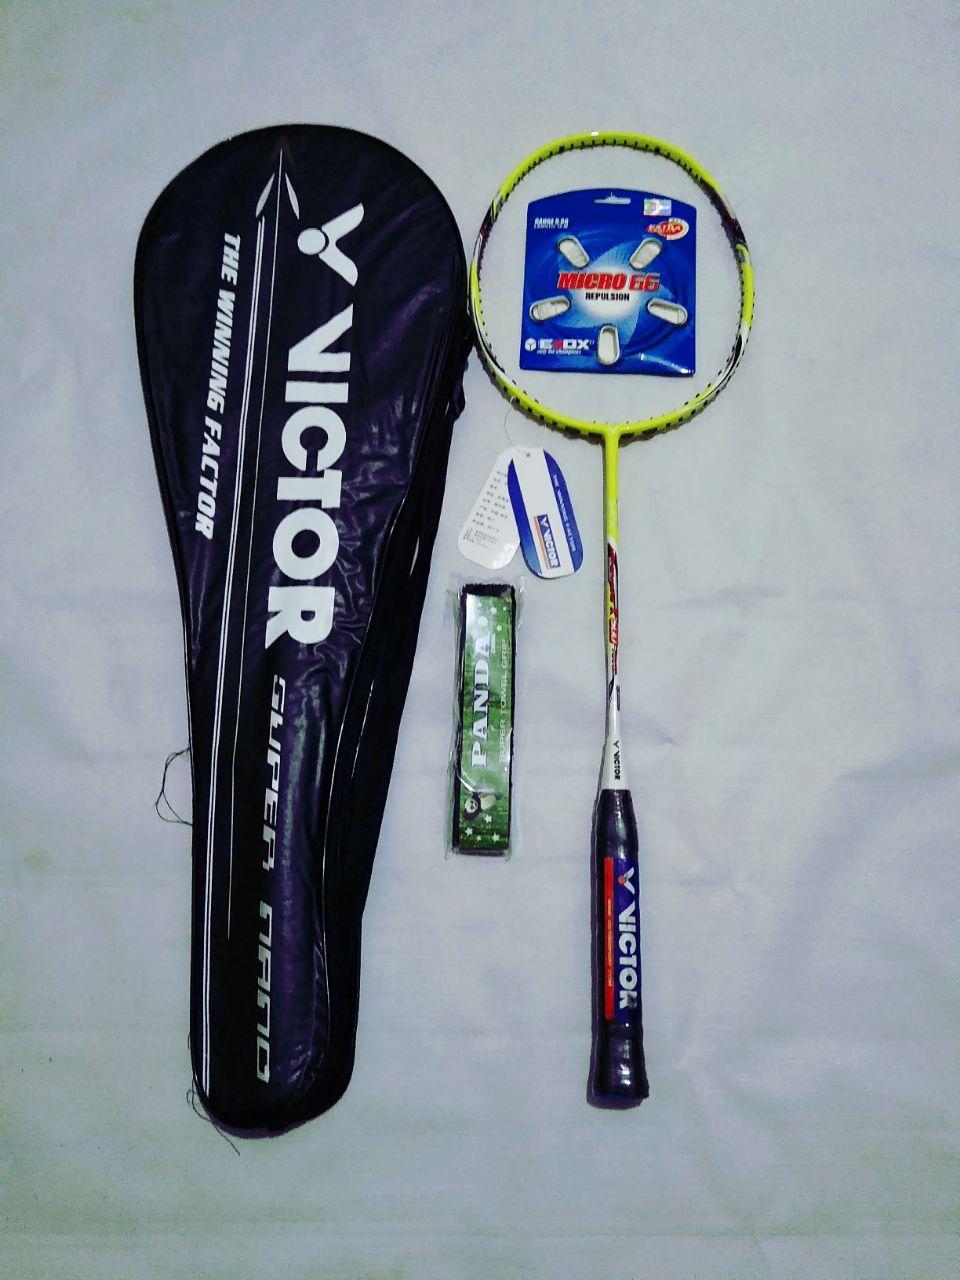 Raket Badminton Victor Hypernano X-500 + Bonus Lengkap (Senar +Tas + Grip)